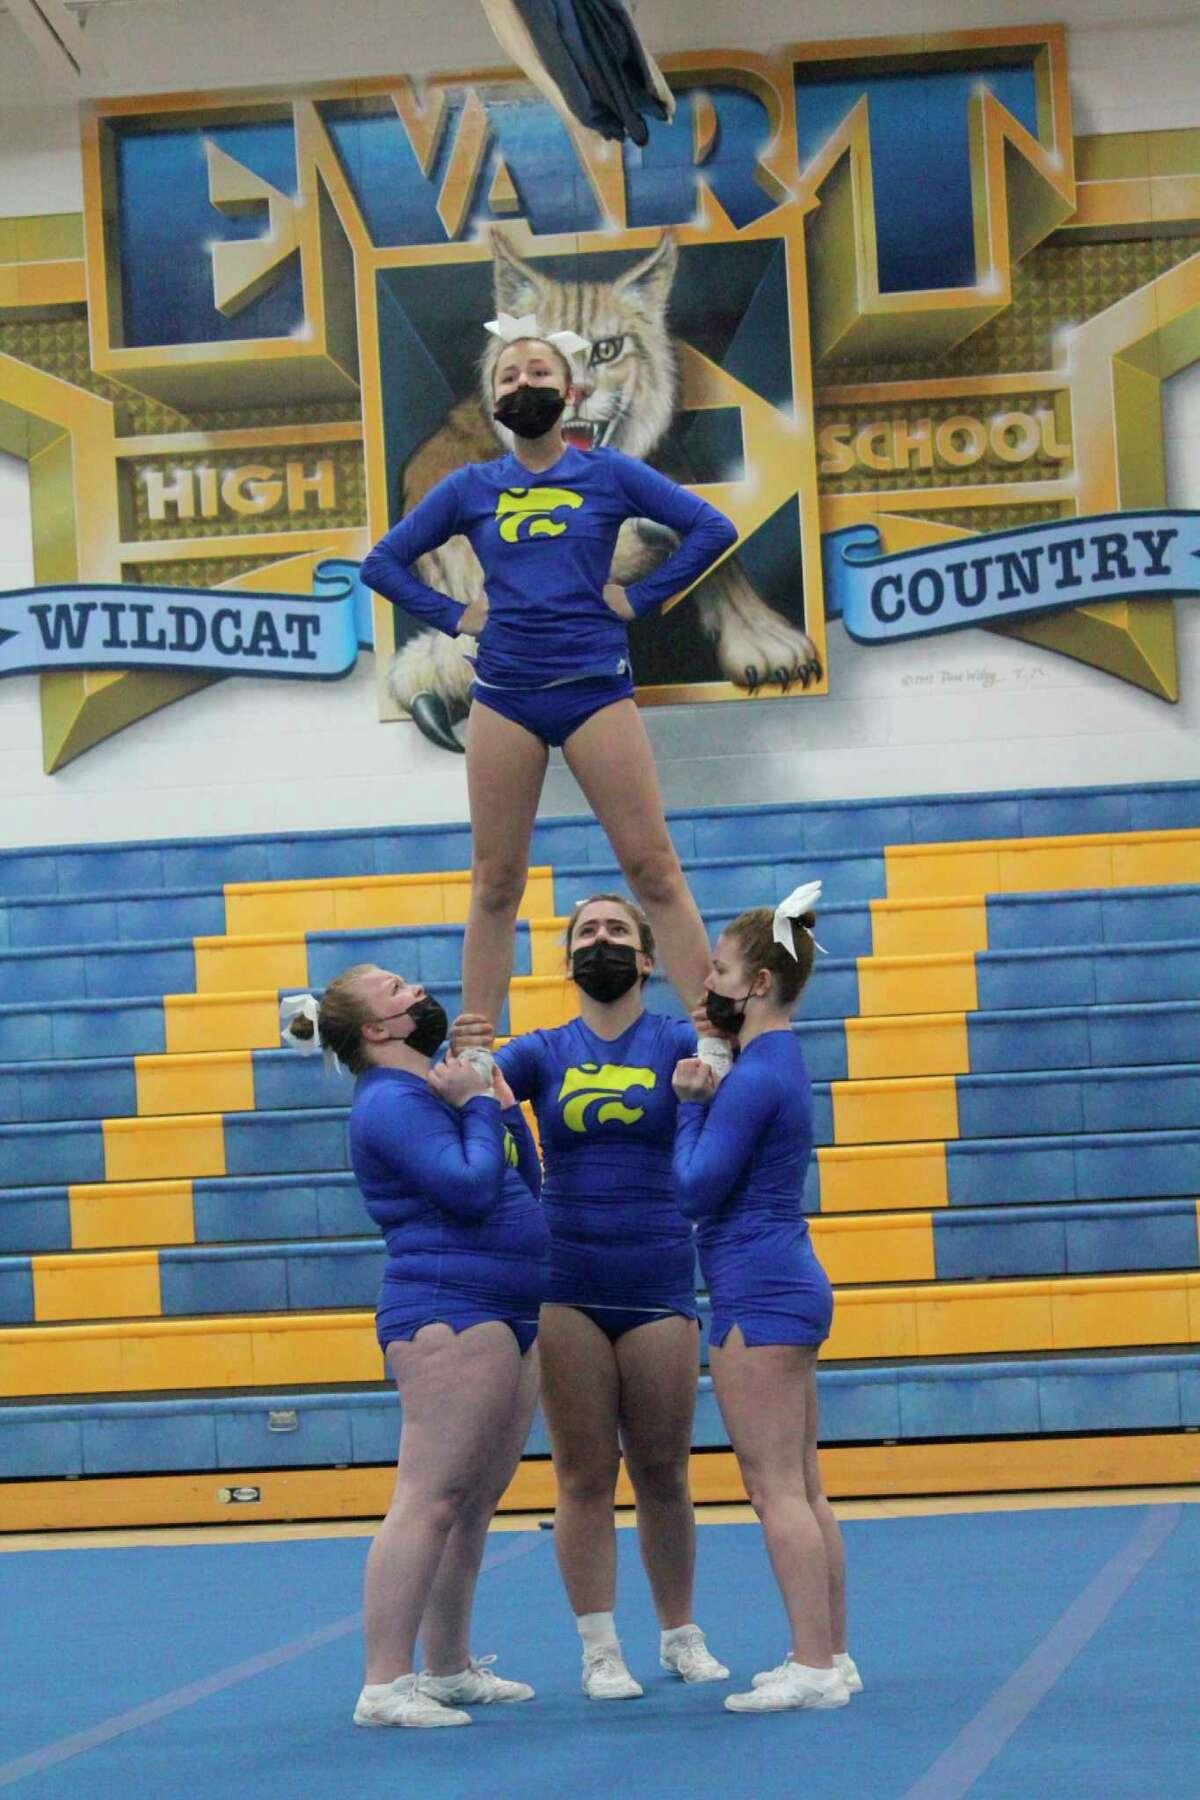 Evart cheerleaders hope to be a championship contender next season. (Pioneer file photo)